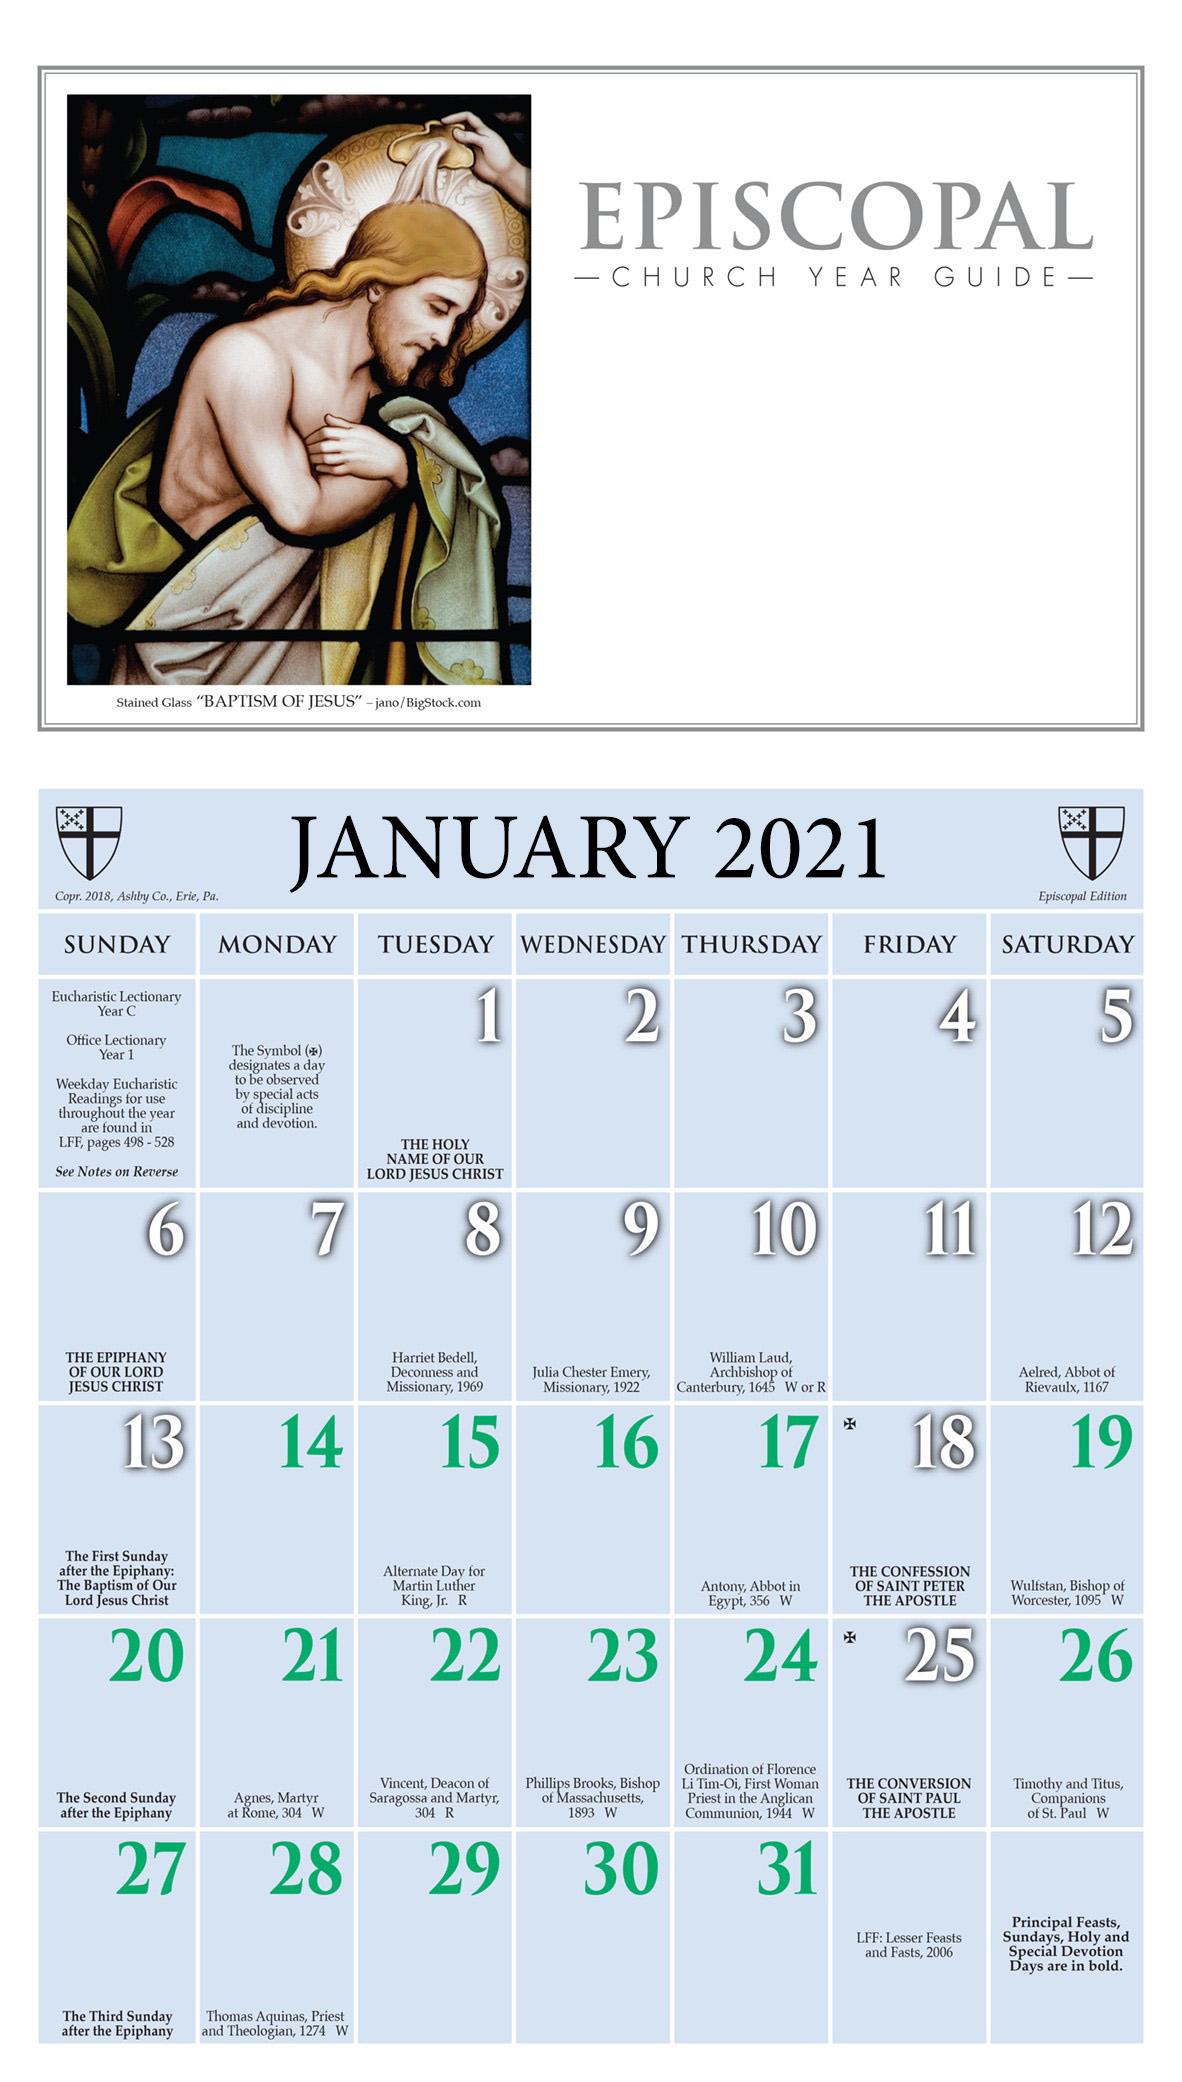 Churchpublishing: Episcopal Church Year Guide Kalendar 2021